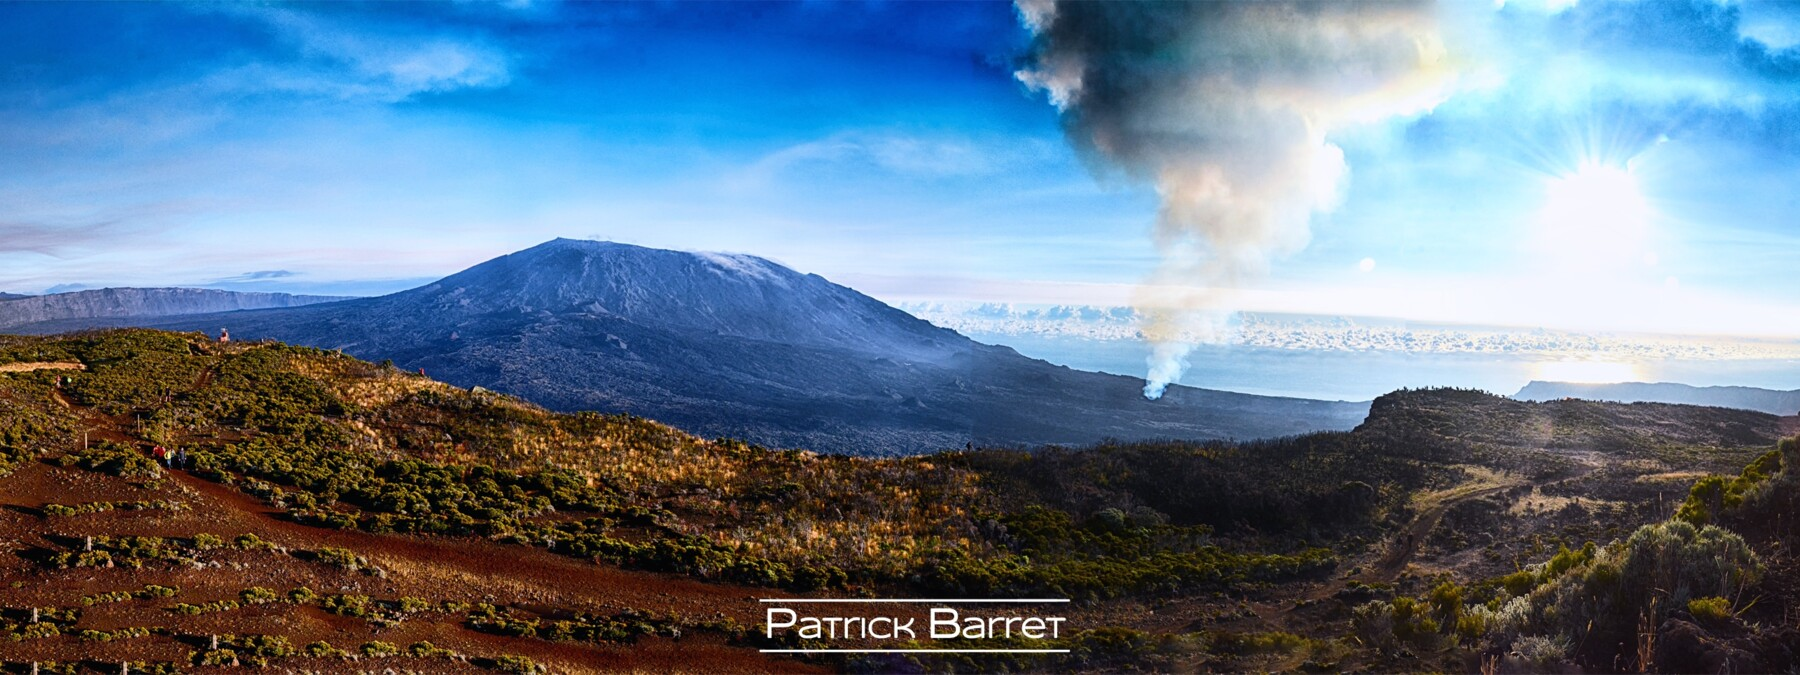 Patrick Barret